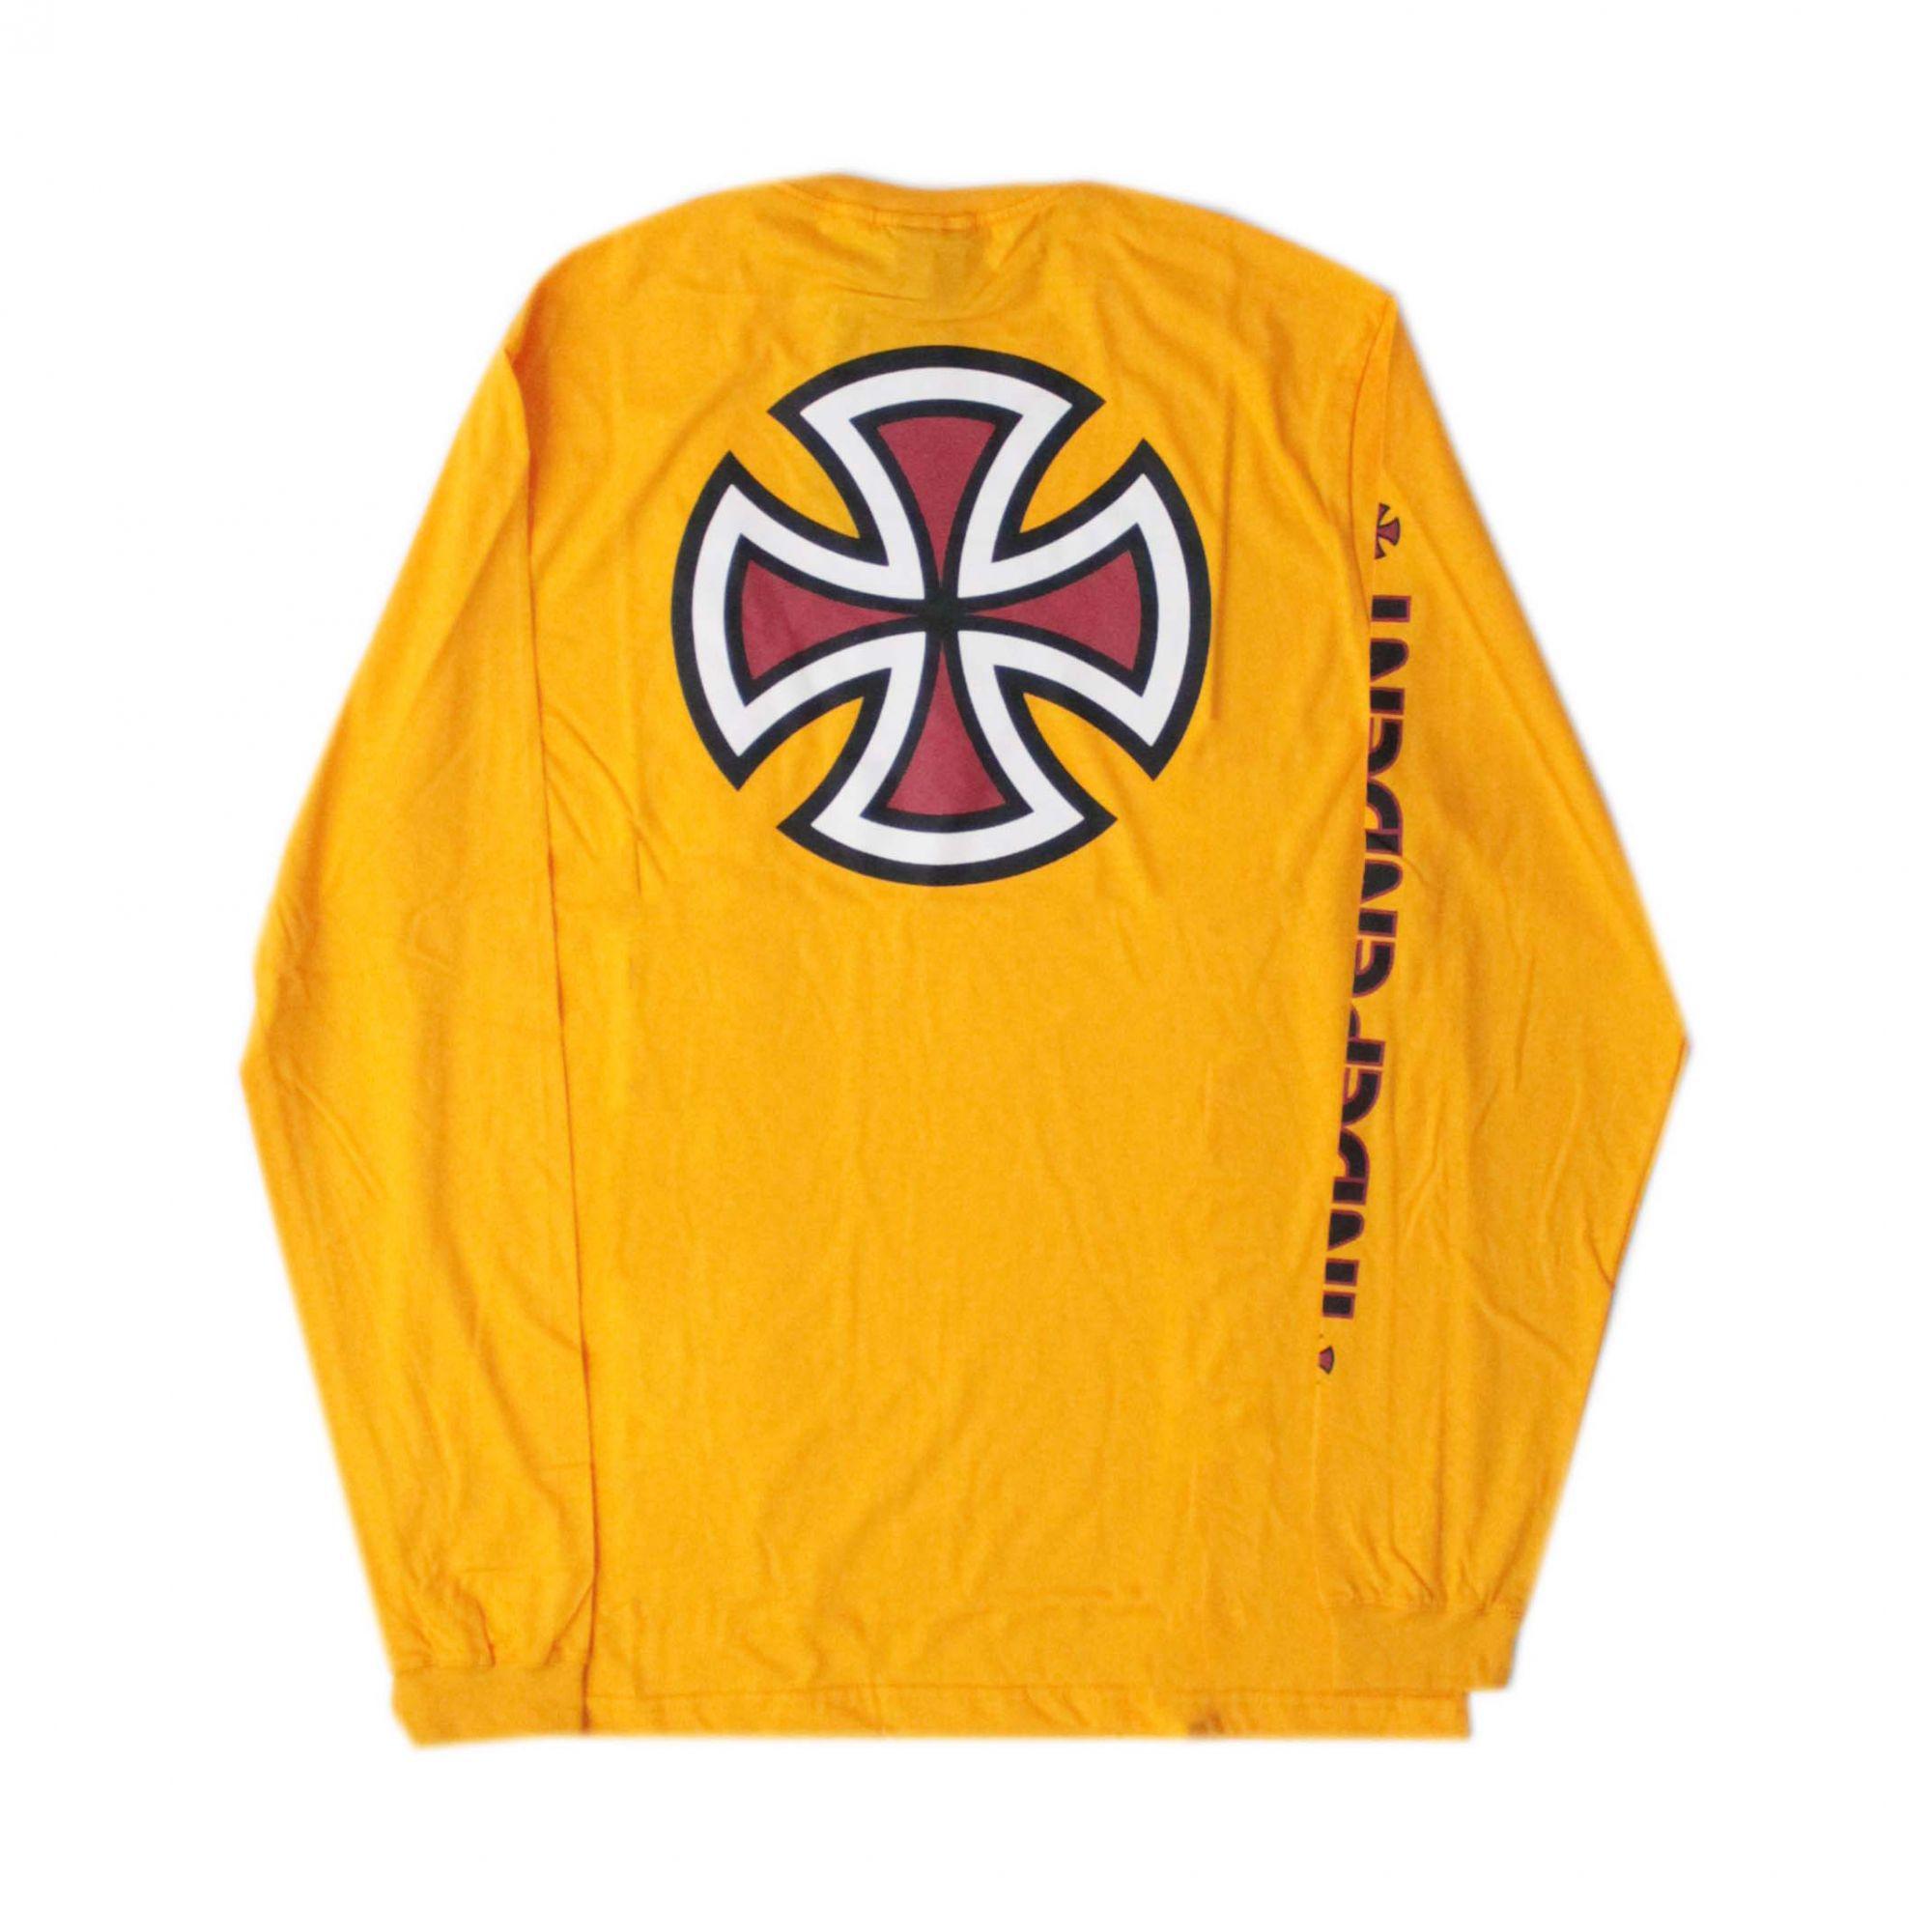 Camiseta Manga Longa Independent Bar Cross Amarelo